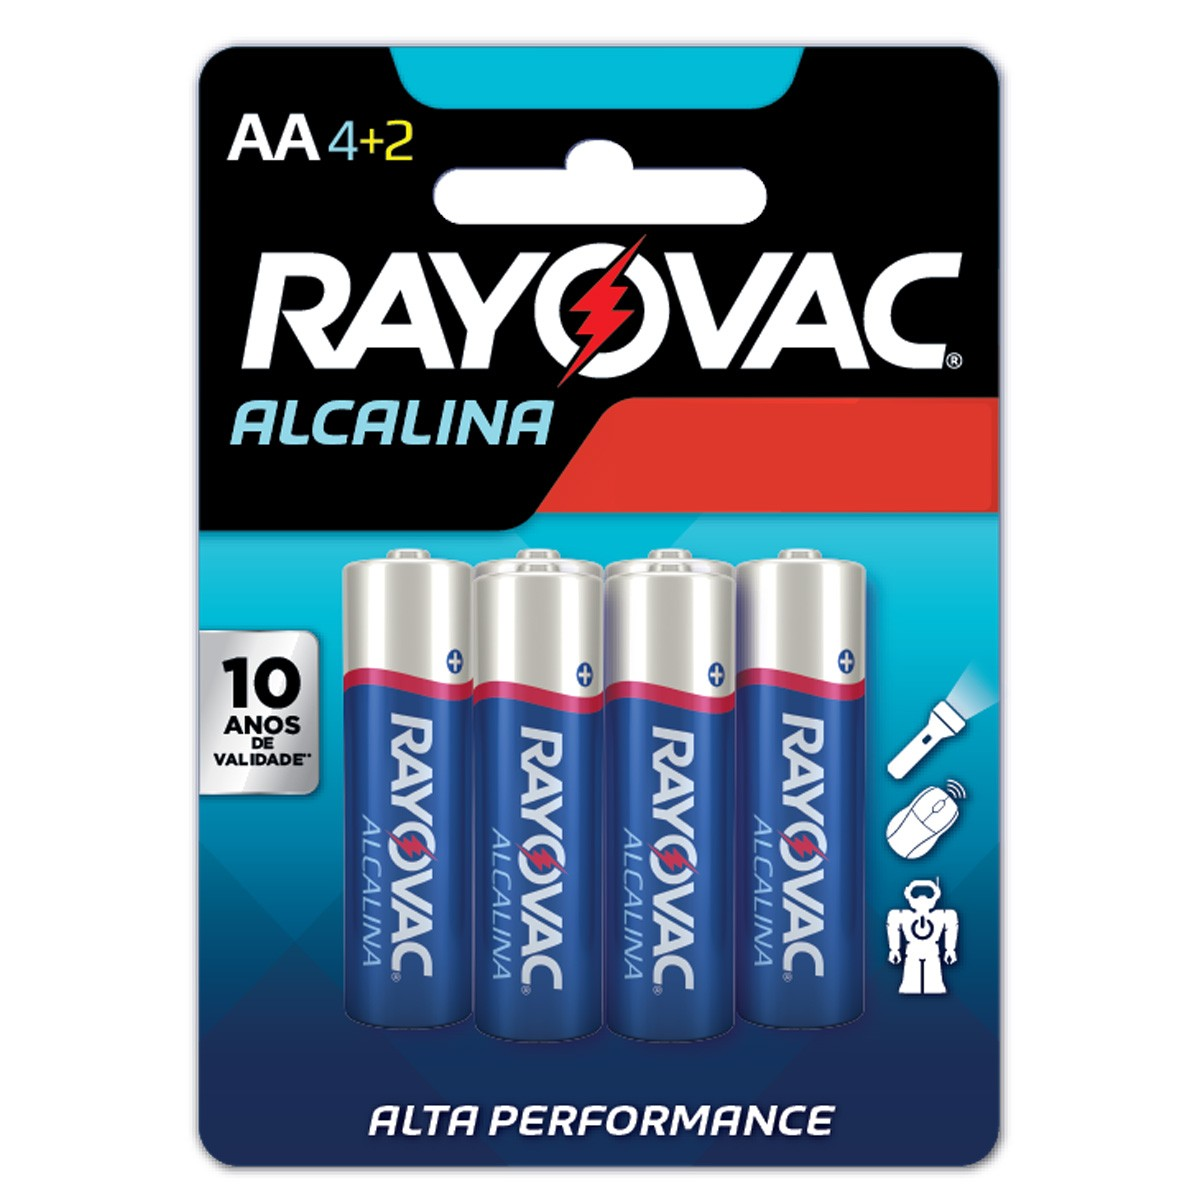 180 Pilhas AA Alcalina RAYOVAC 30 cartelas